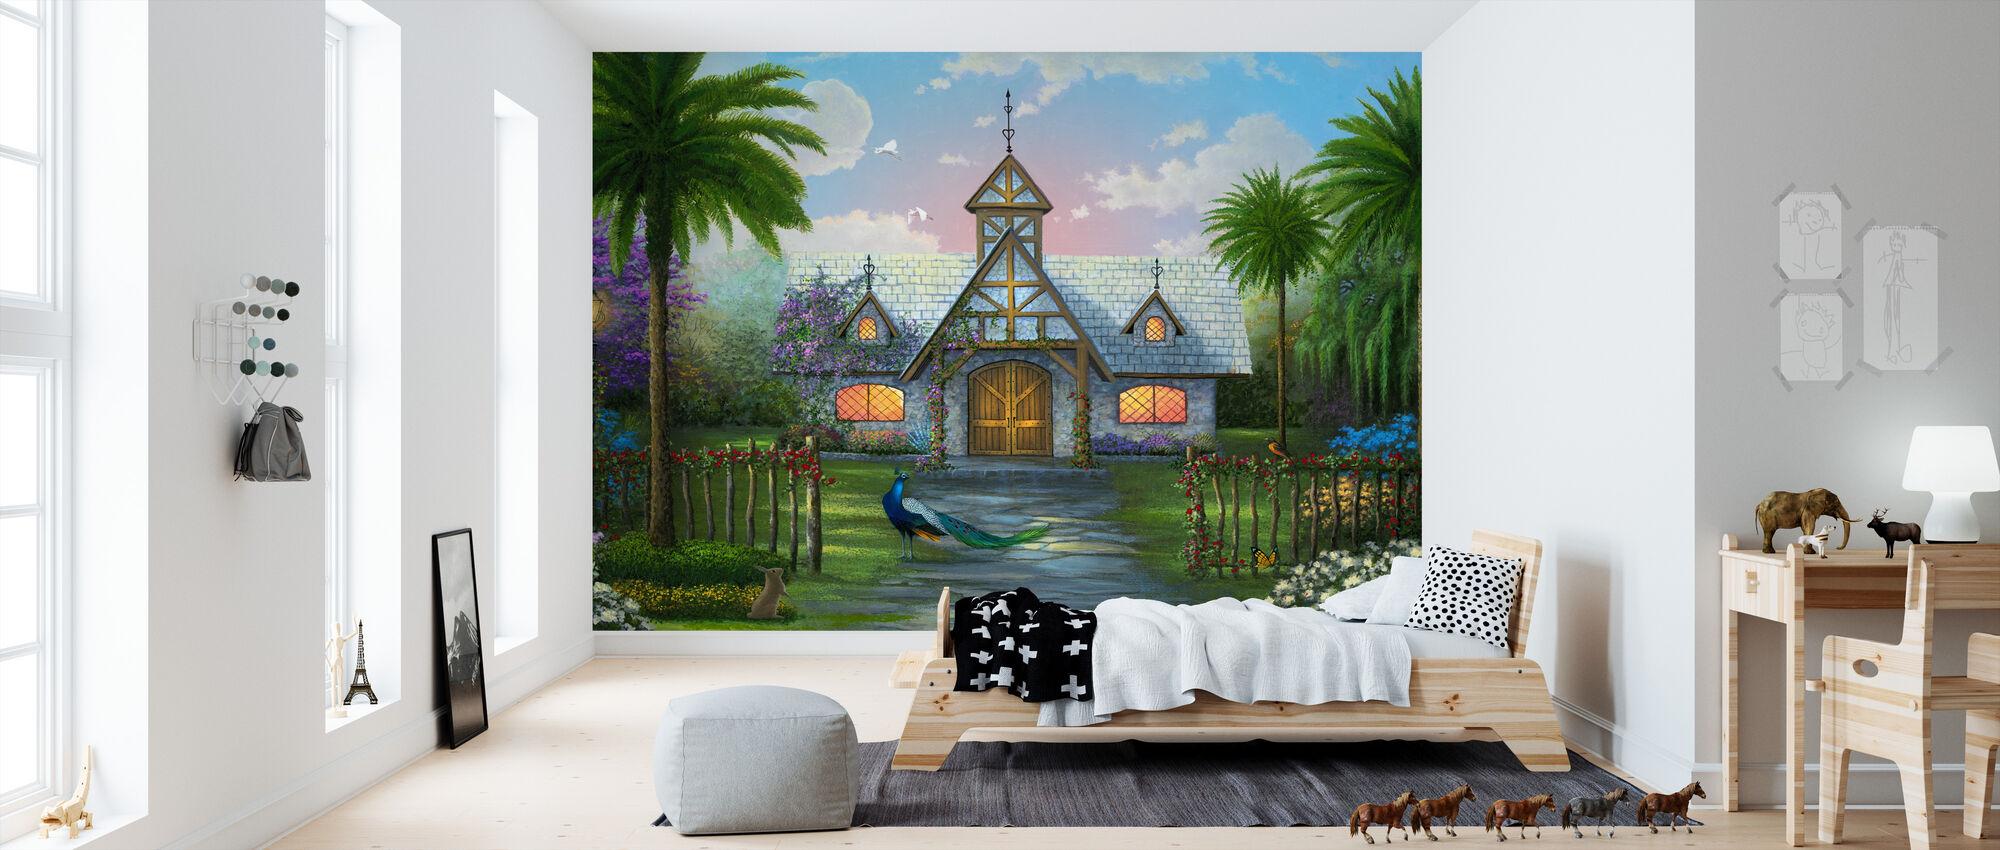 Casa de campo Paradise - Papel pintado - Cuarto de niños